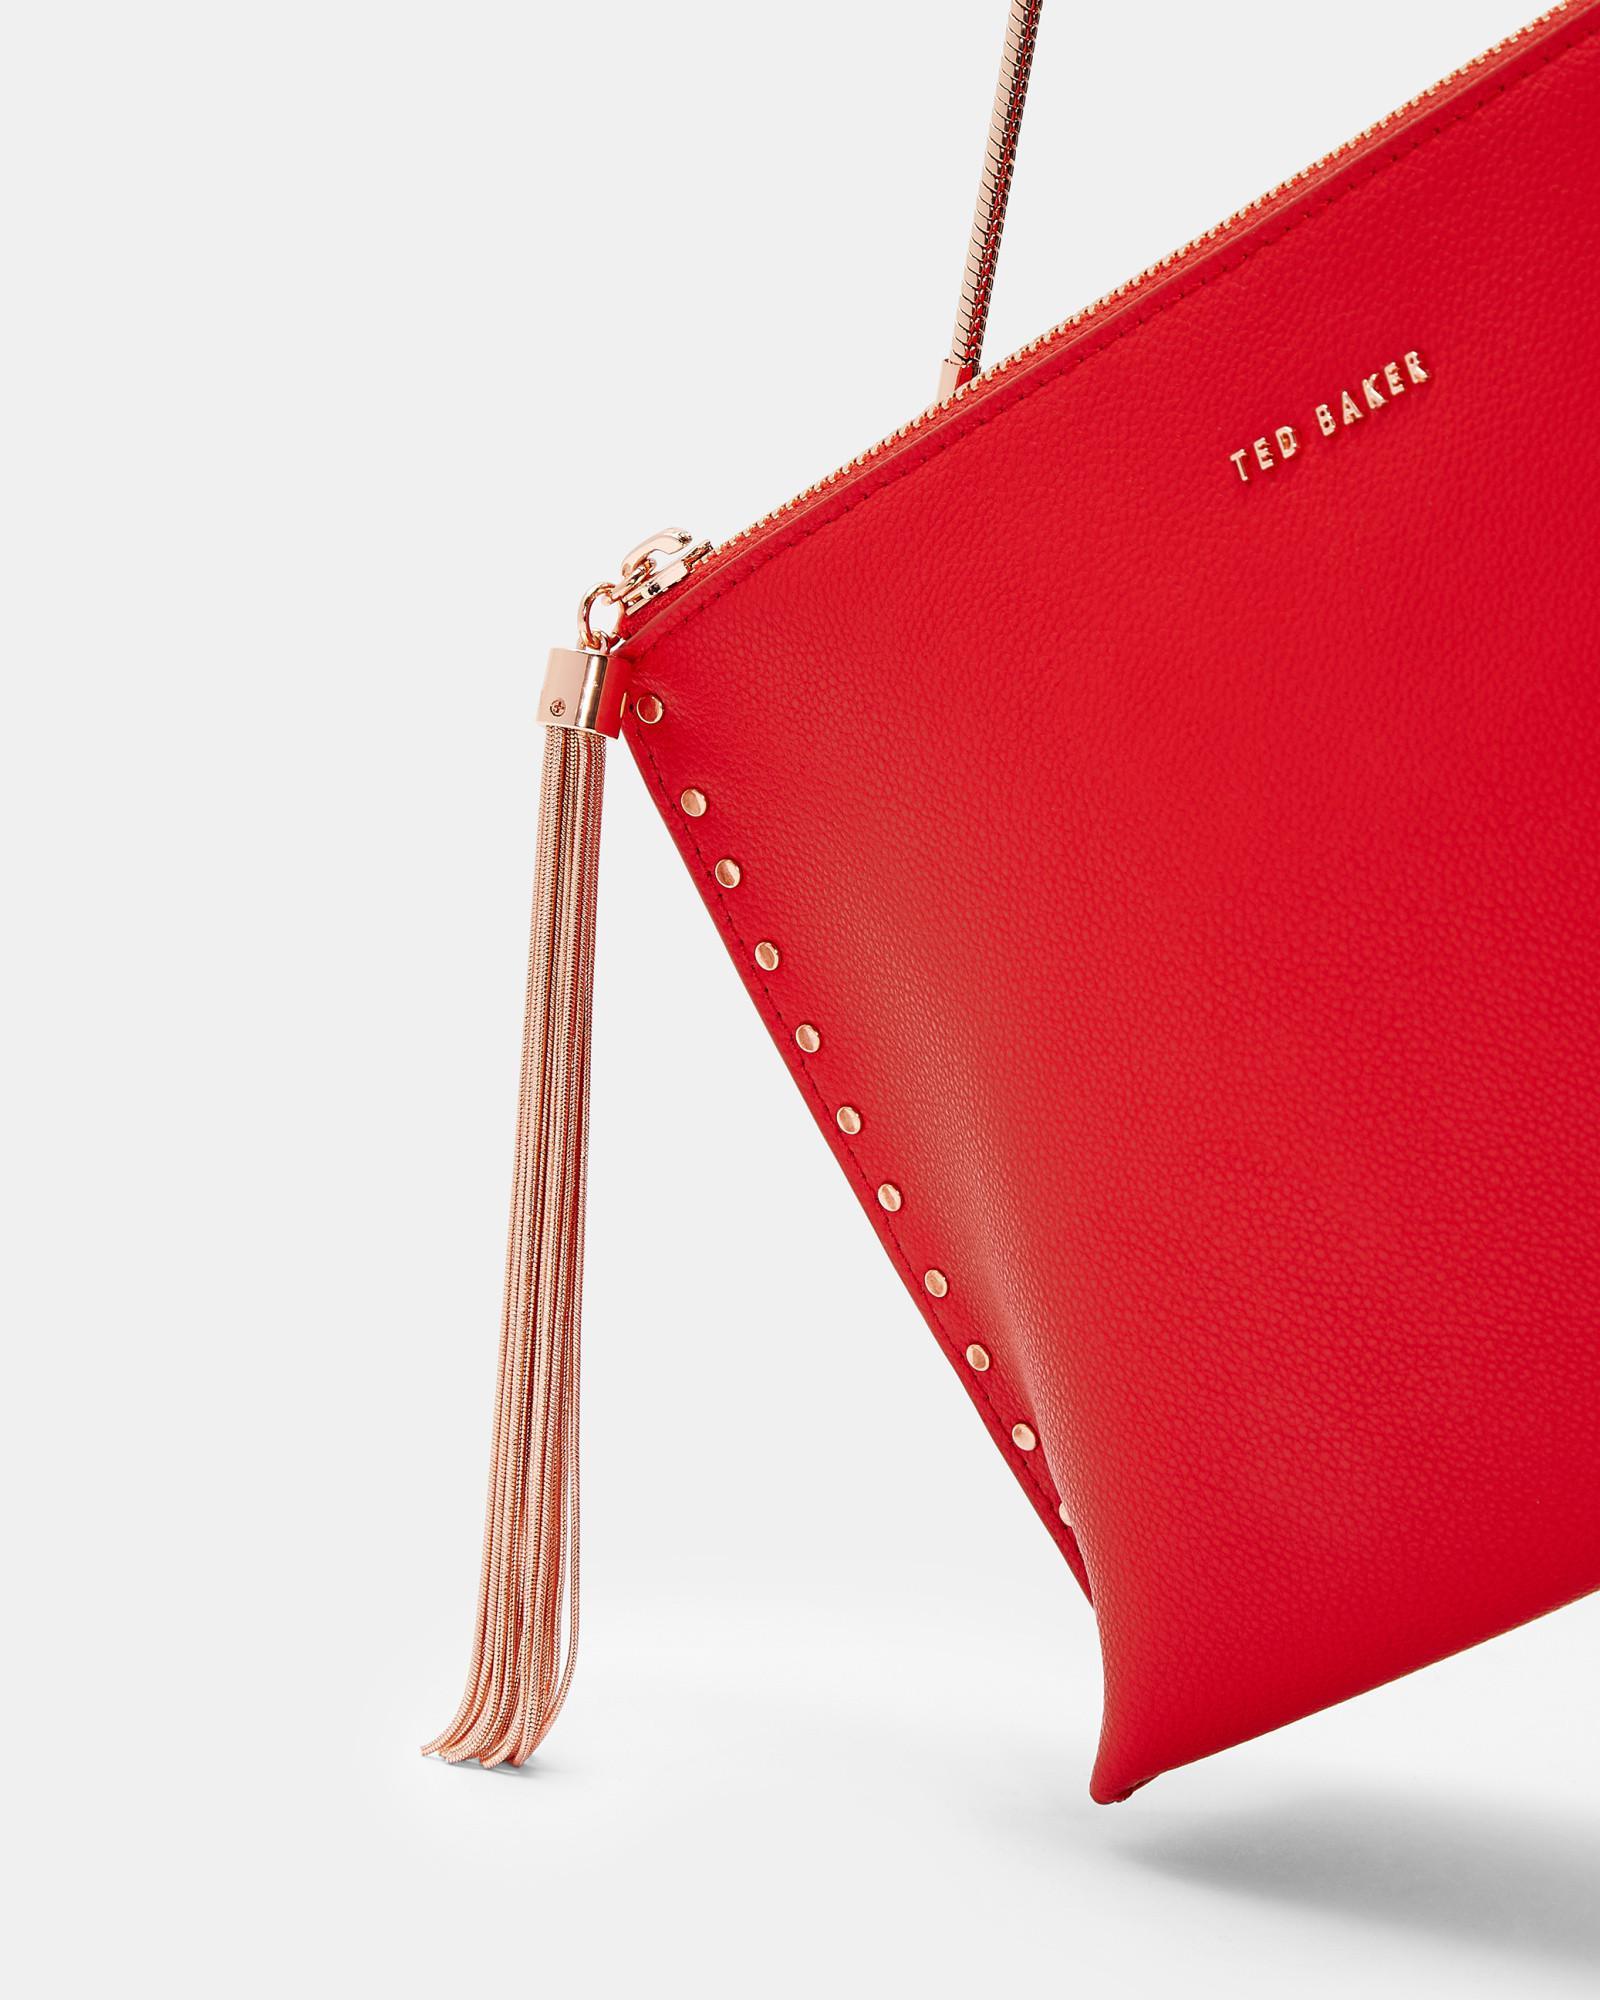 706d3fad18 Ted Baker - Red Chain Tassel Evening Bag - Lyst. View fullscreen